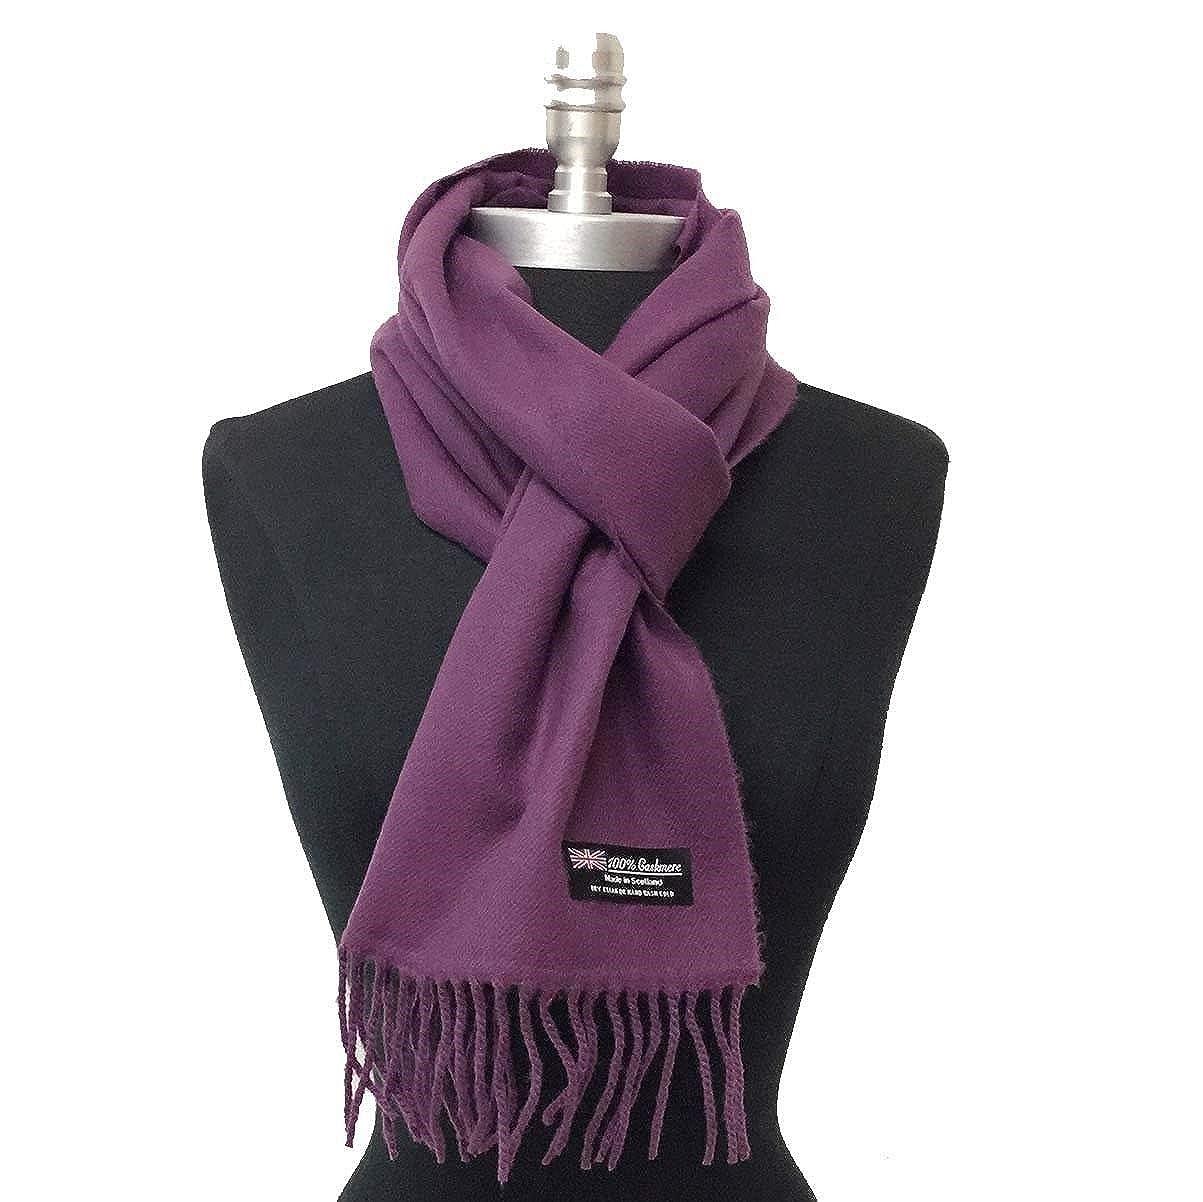 1678e65d912ed Fashion Women's Winter 100% Cashmere Scarf Wrap Scotland Soft Solid Dark  Purple at Amazon Women's Clothing store: